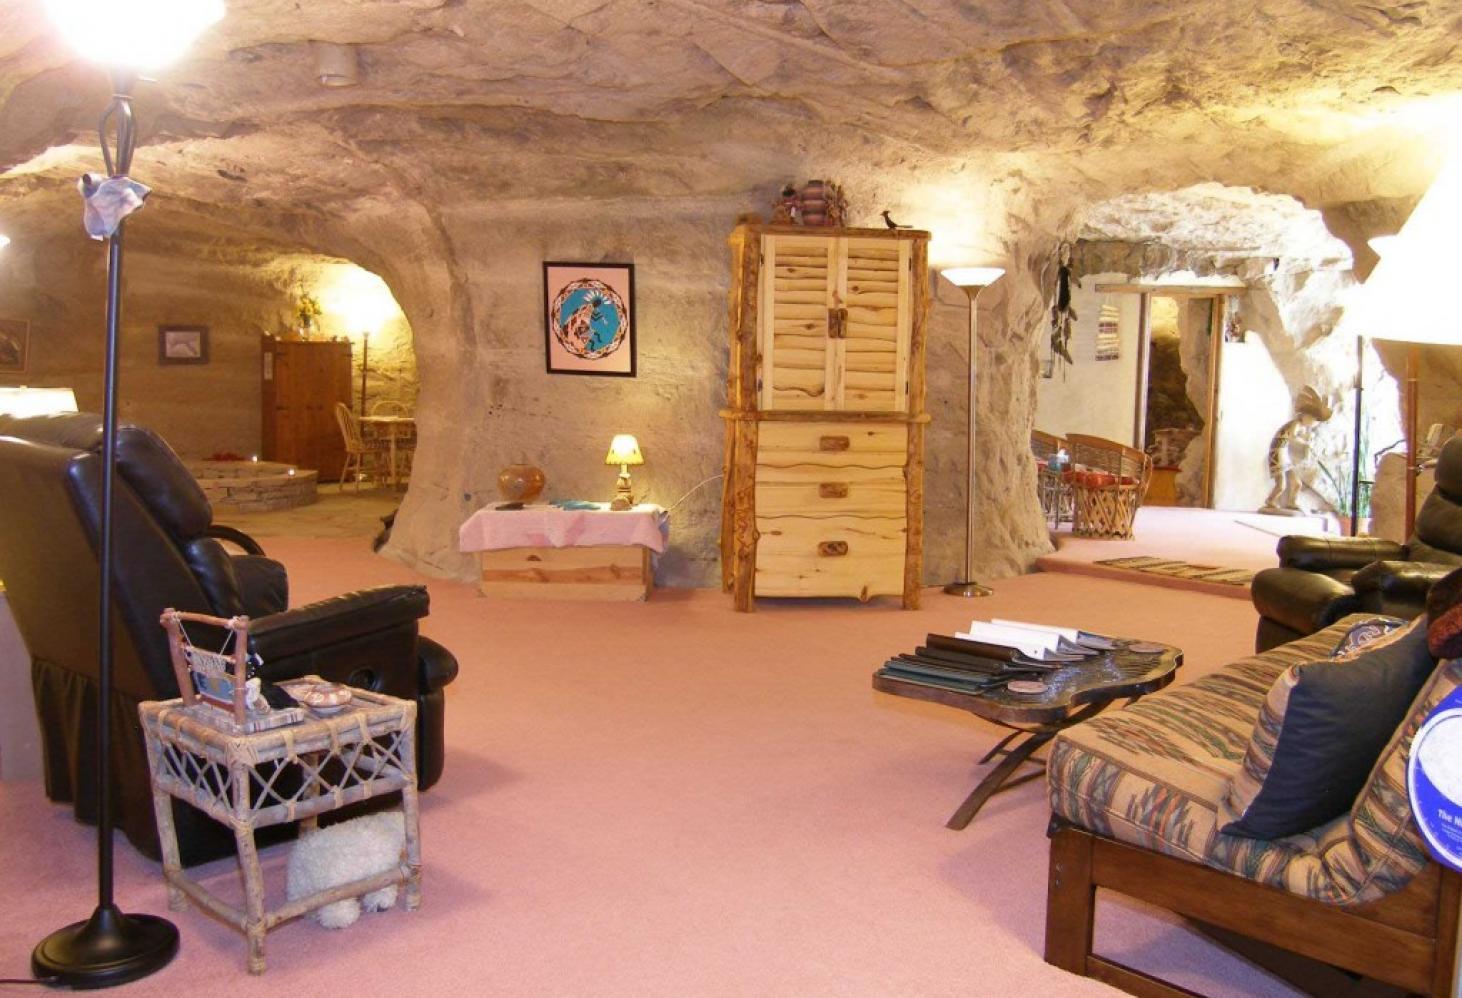 Отель-пещера — Kokopelli Cave Bed and Breakfast — Фармингтон. США